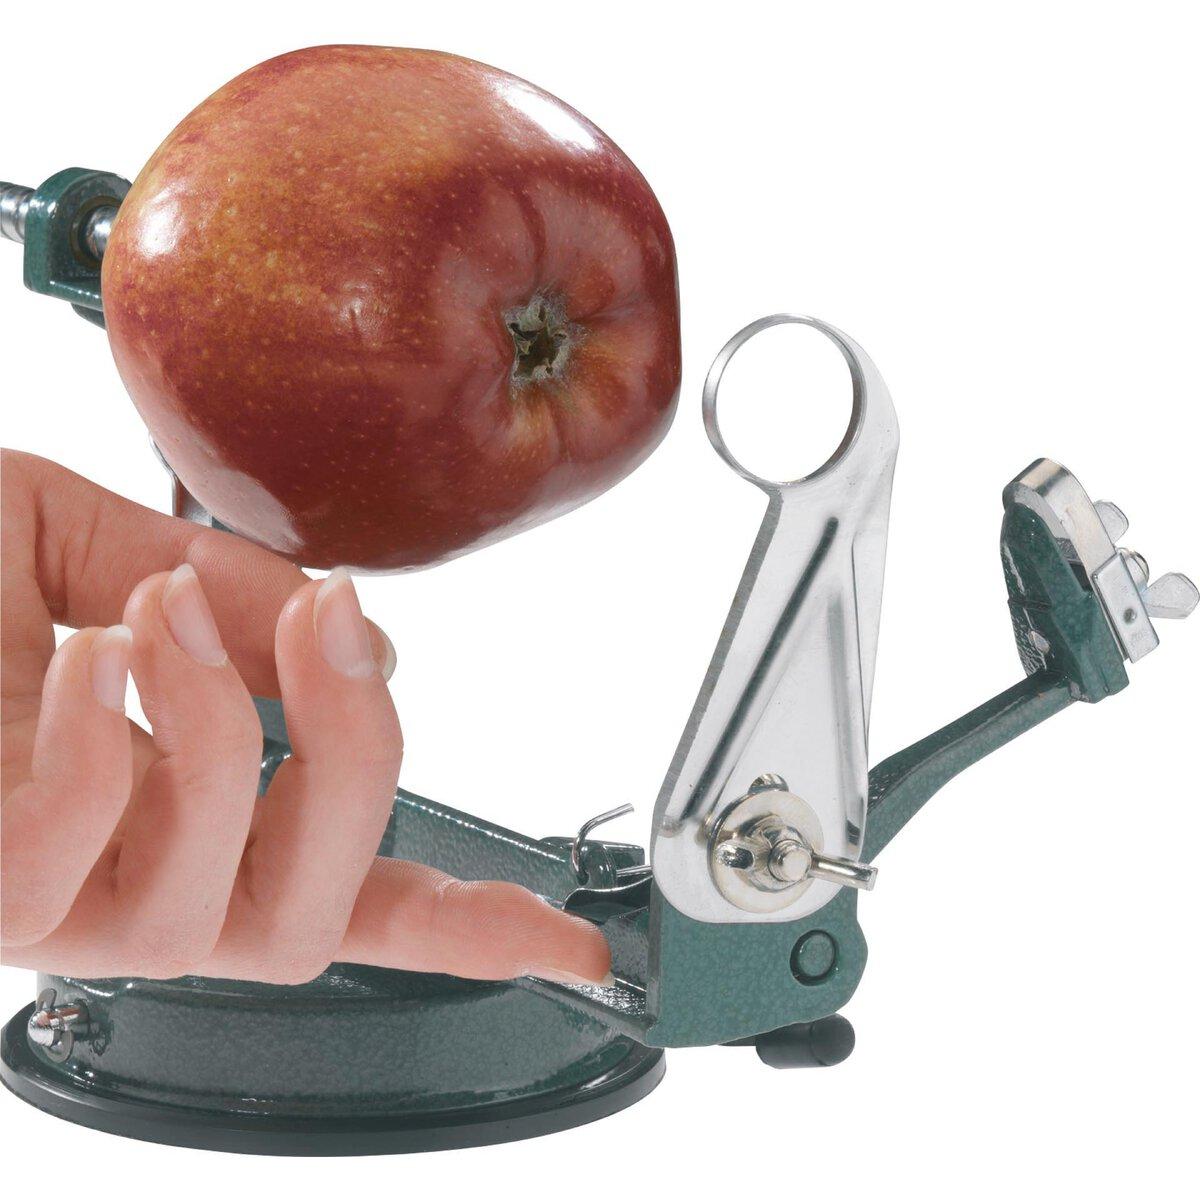 "Apfelschälgerät ""Apfeltraum"" (2)"